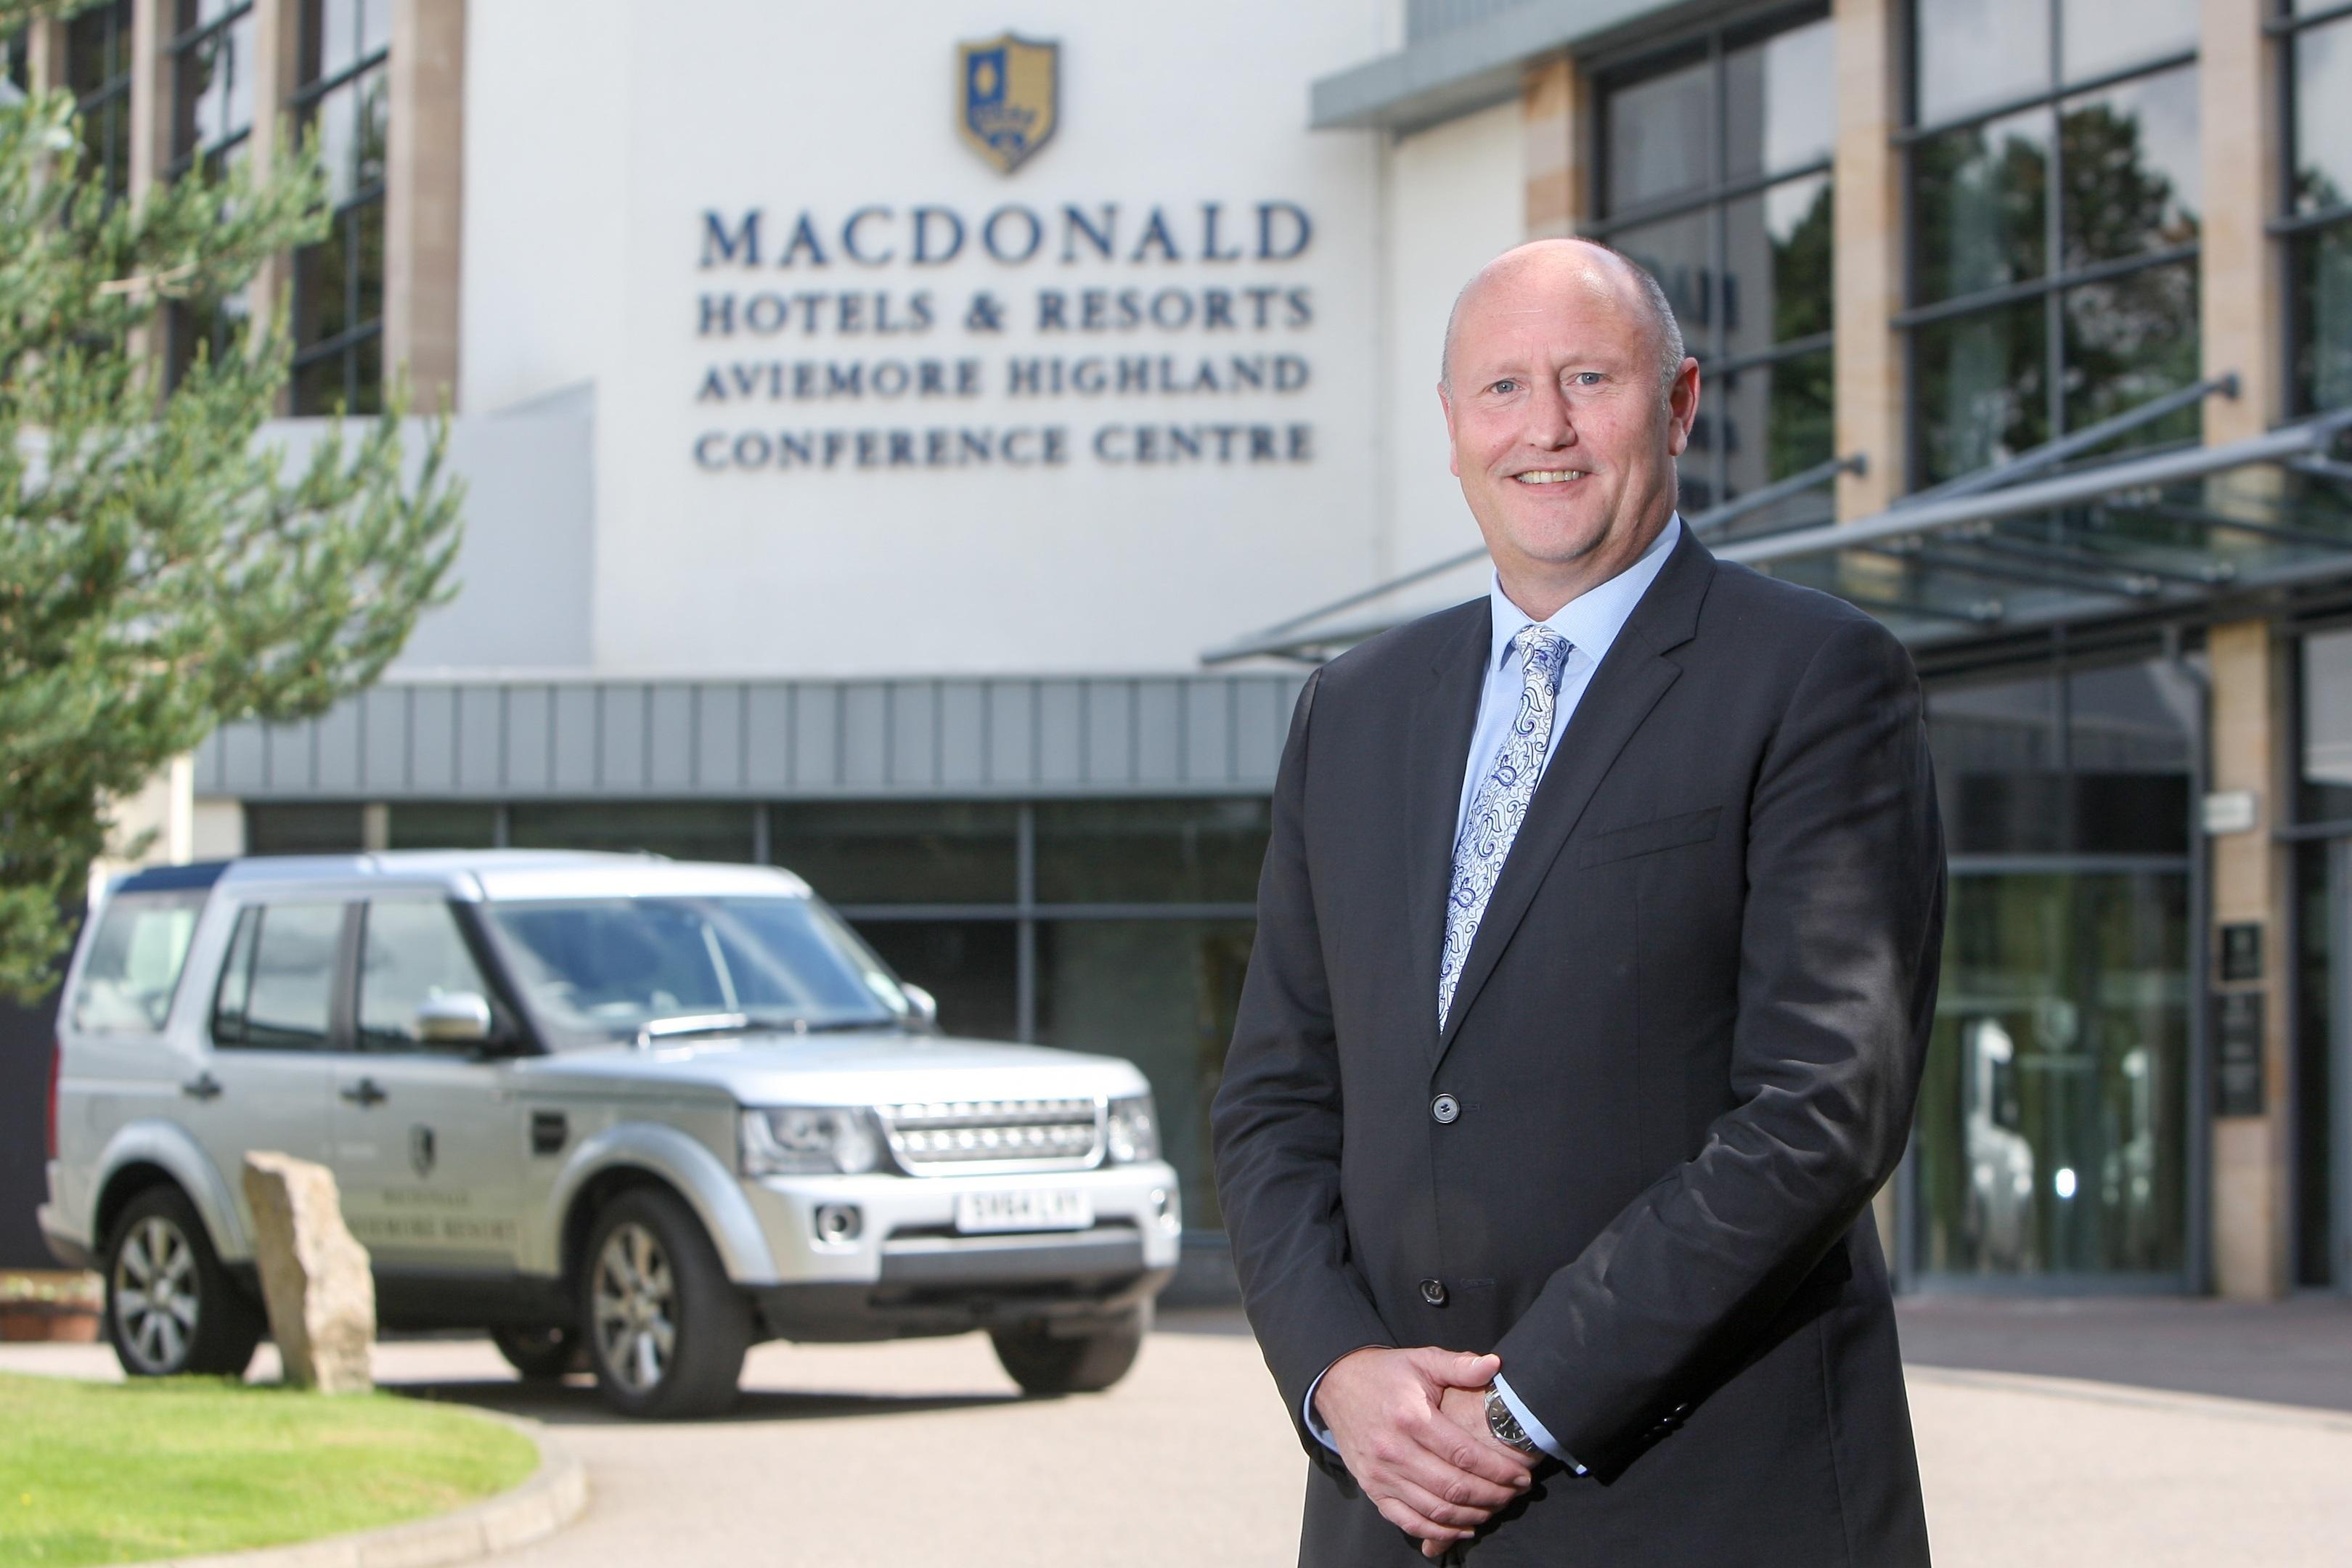 Macdonald Hotels and Resorts' new north chief, Simon Farr.